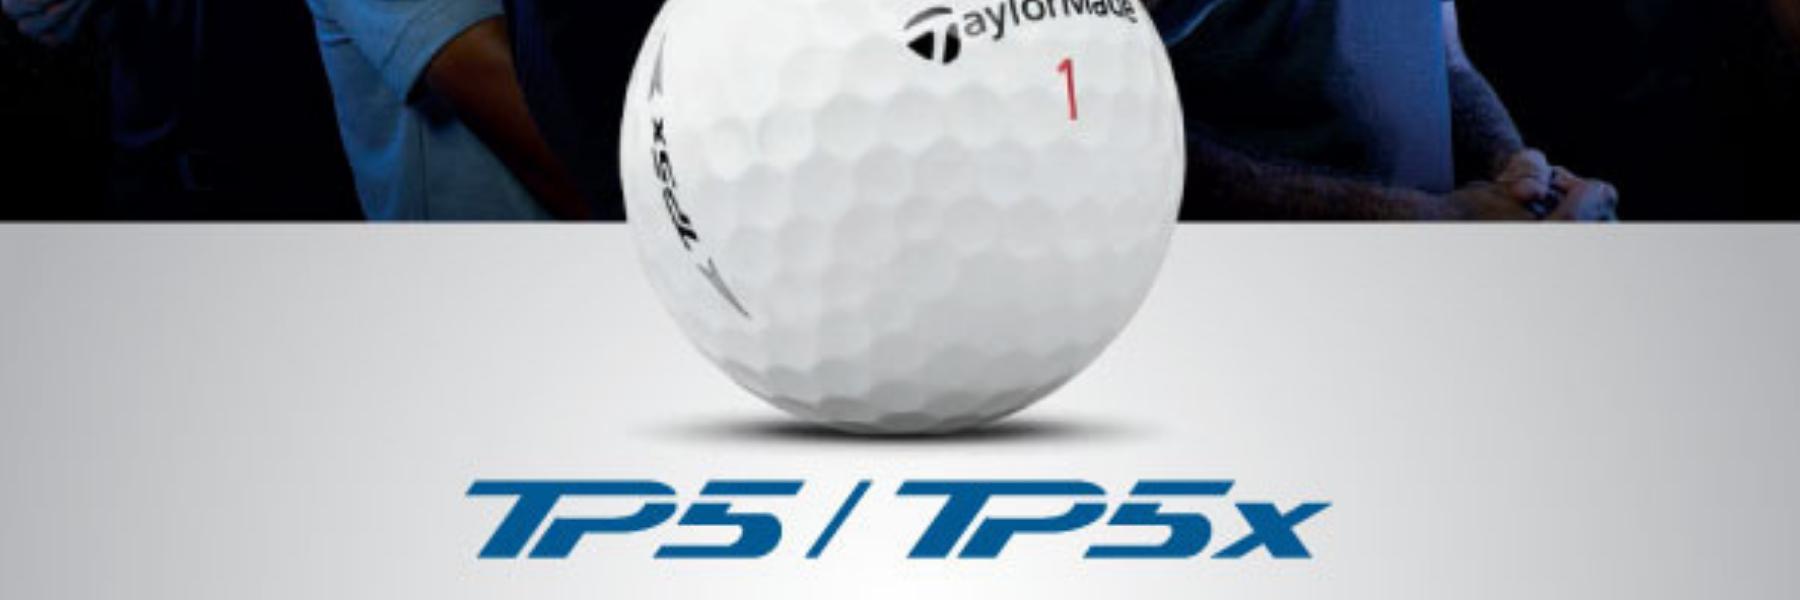 Golf Ball Special